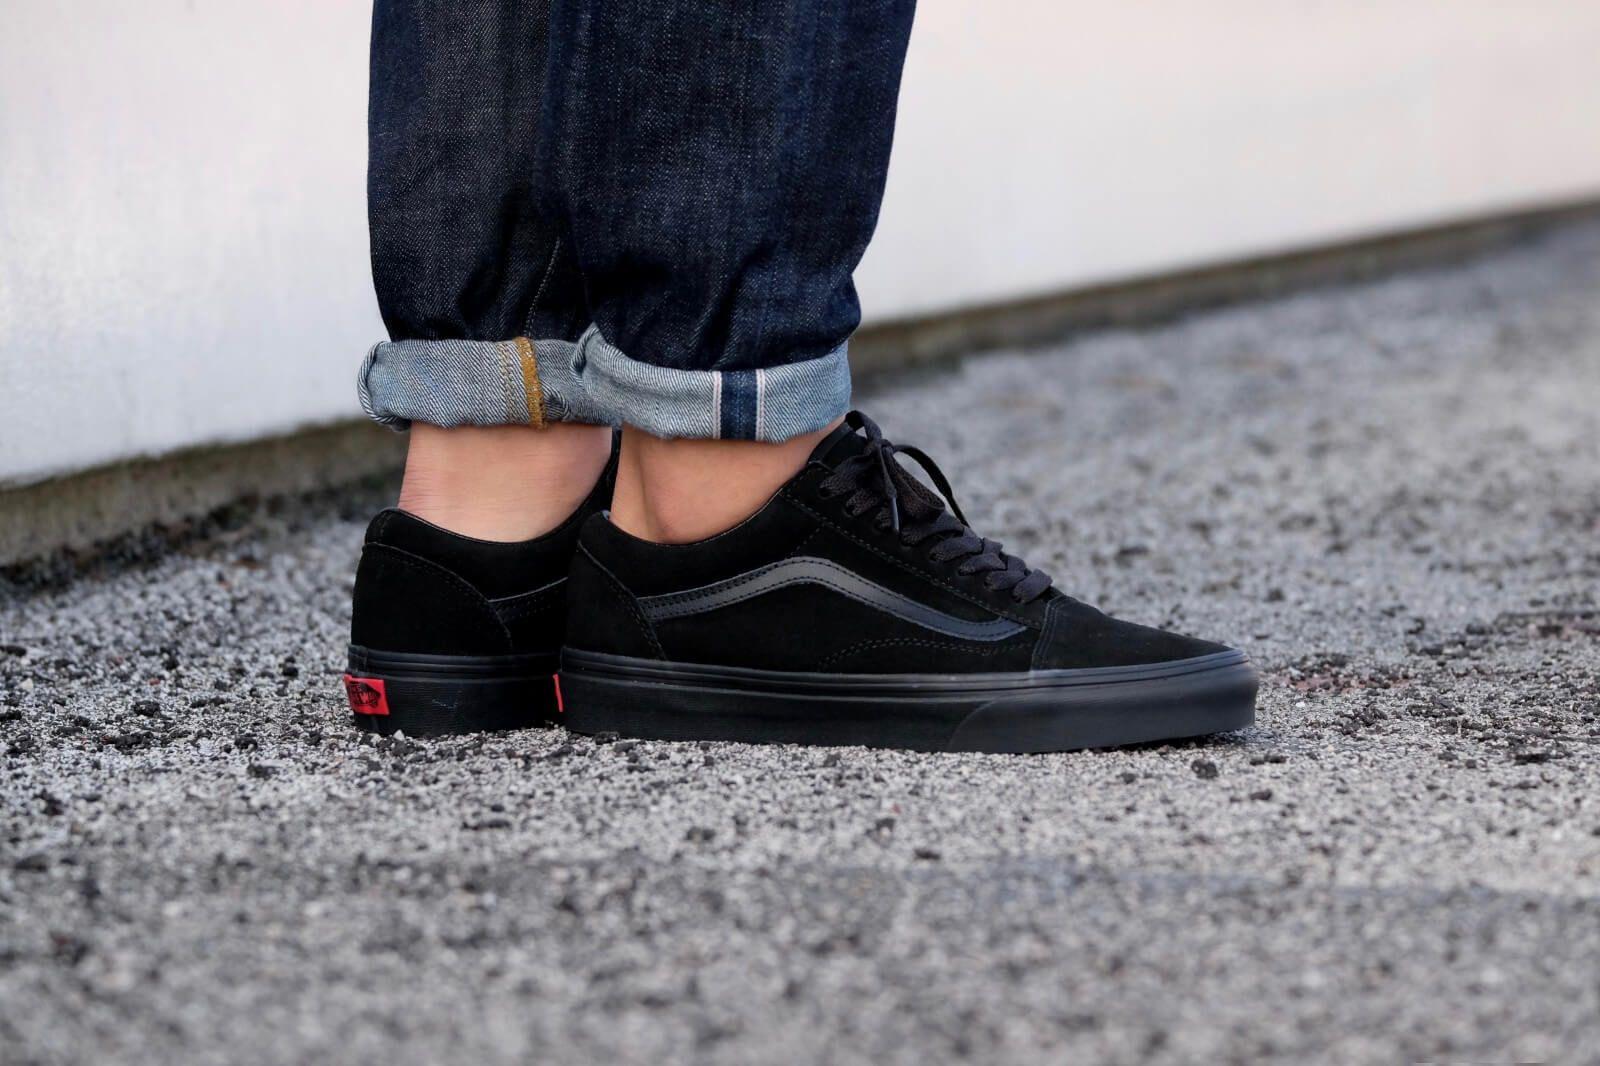 7ed8991d515 Vans Old Skool Suede Black VN0A38G1NRI Vans For Sale  Vans. Find this Pin  and more on sneaker ...